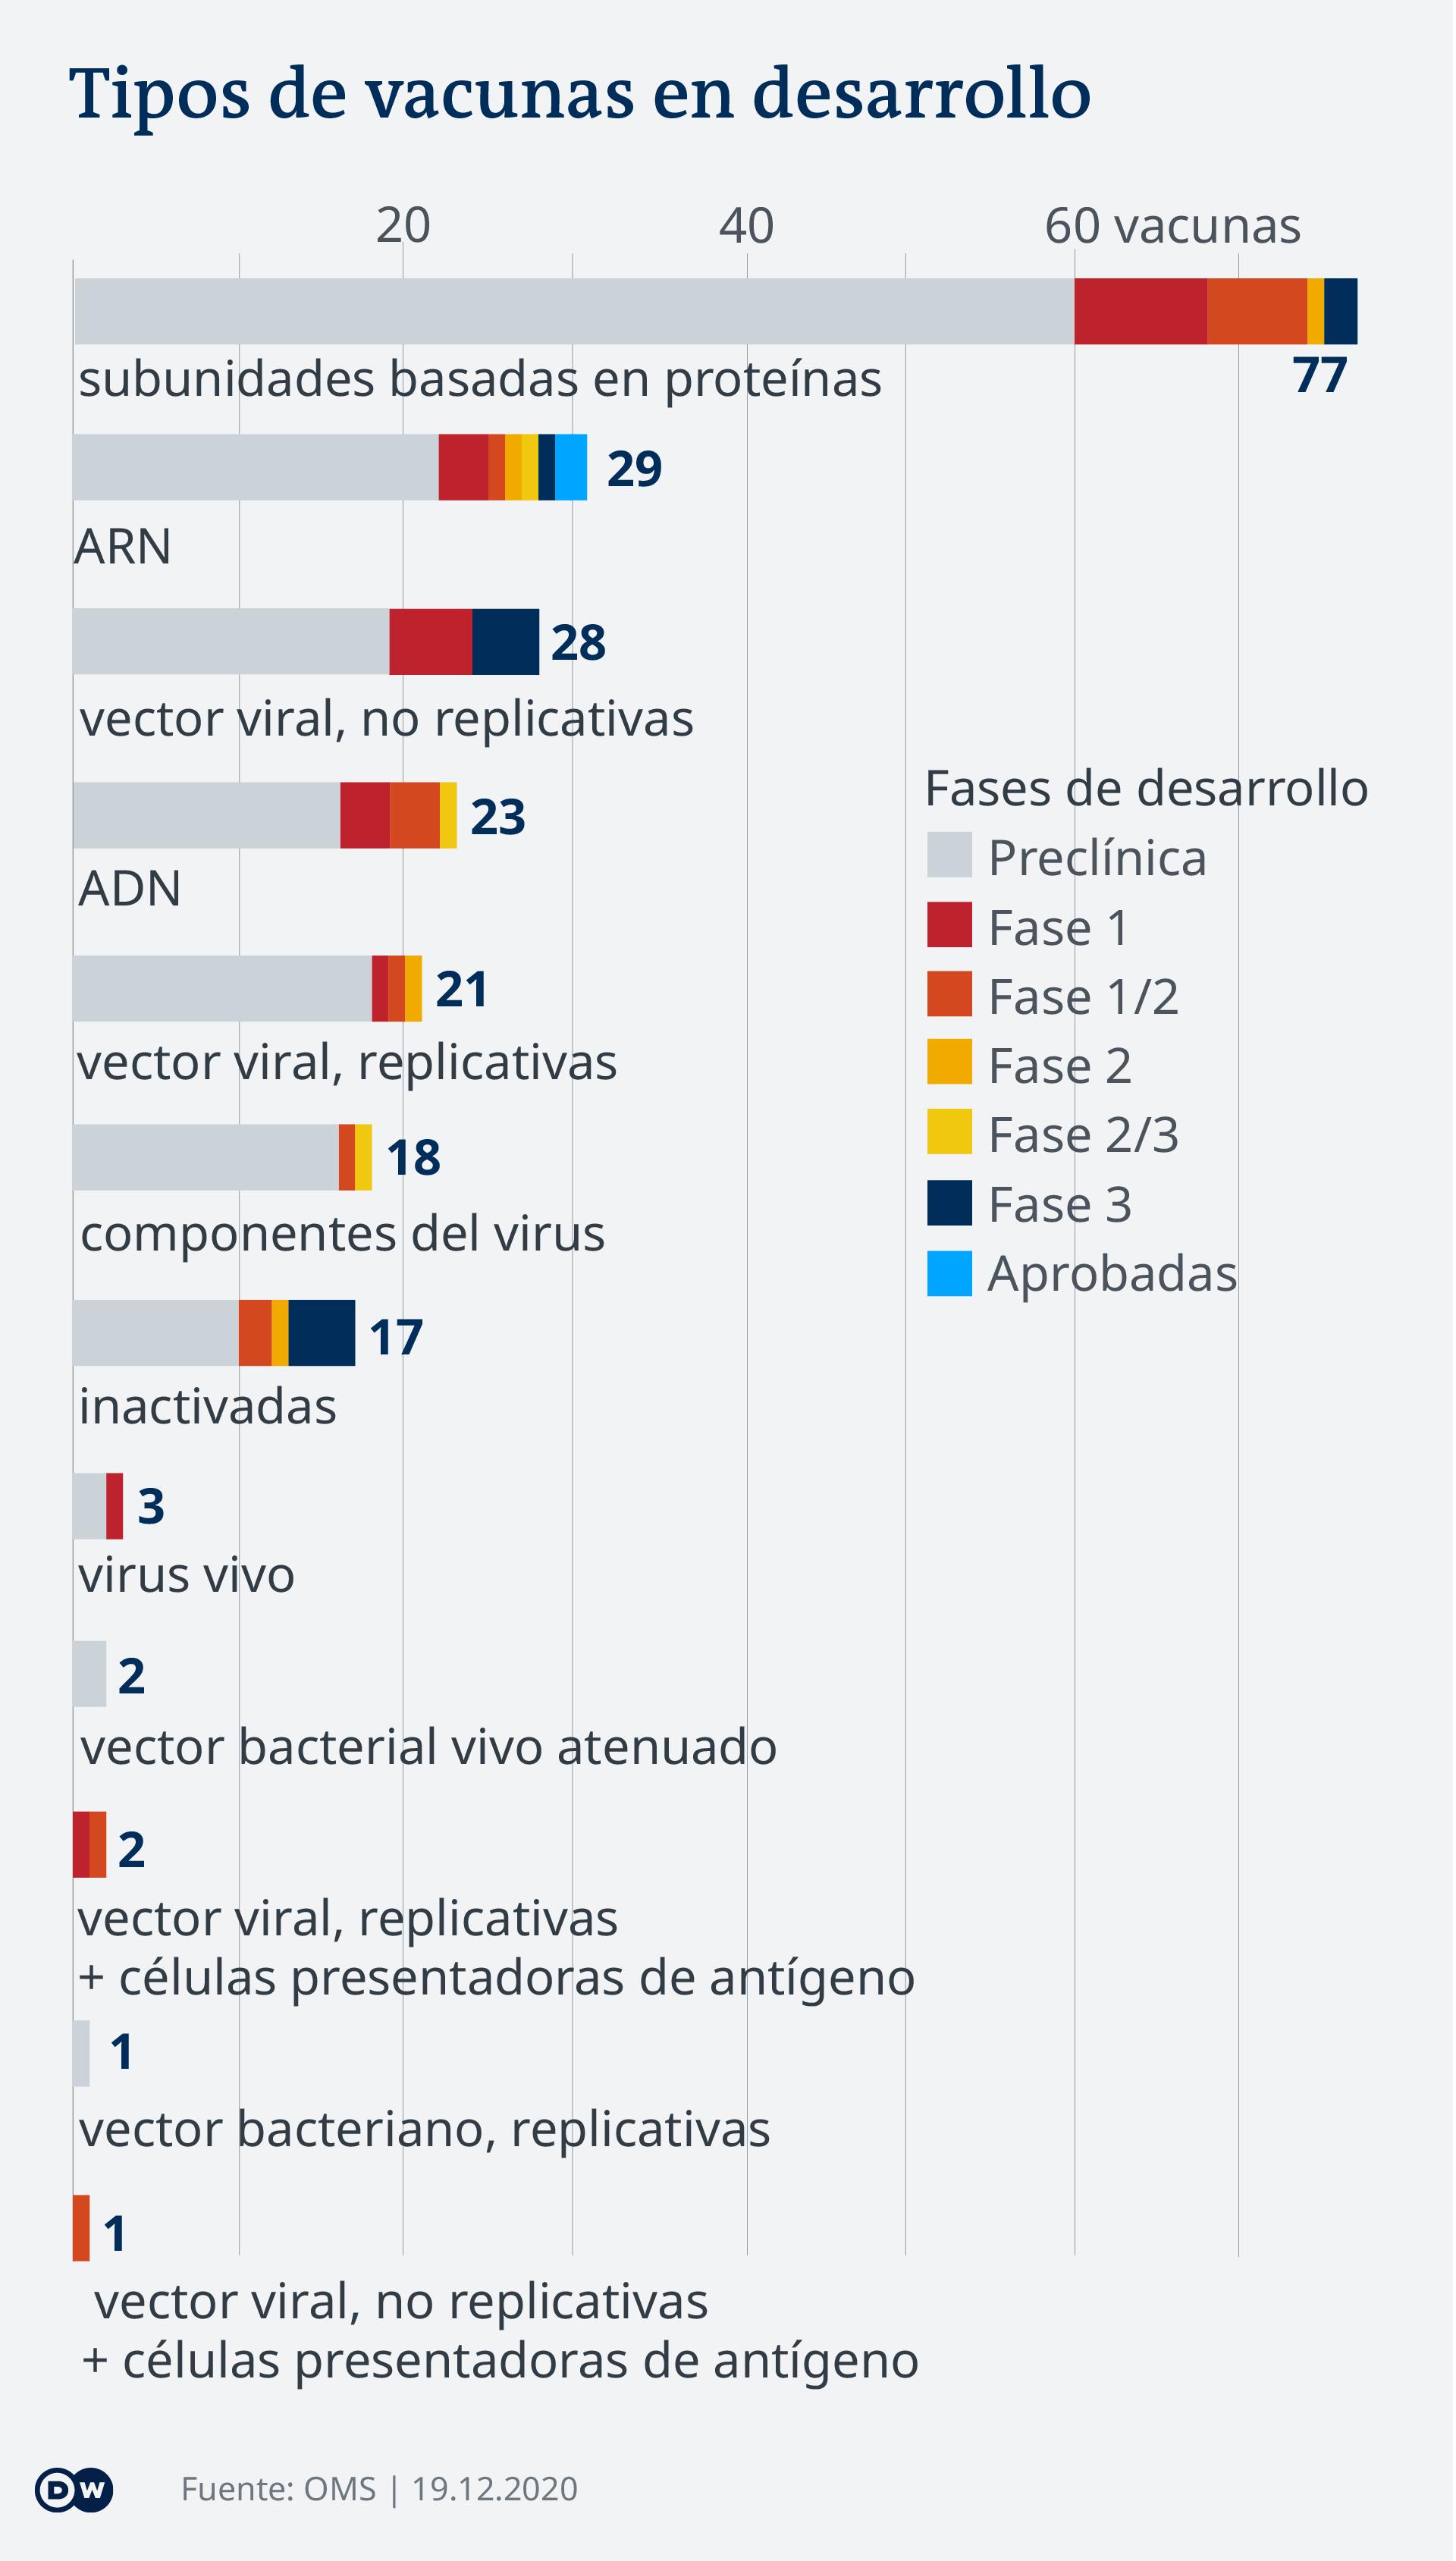 Data visualization - COVID-19 vaccine tracker - Types - Update Dec 19, 2020 - Spanish